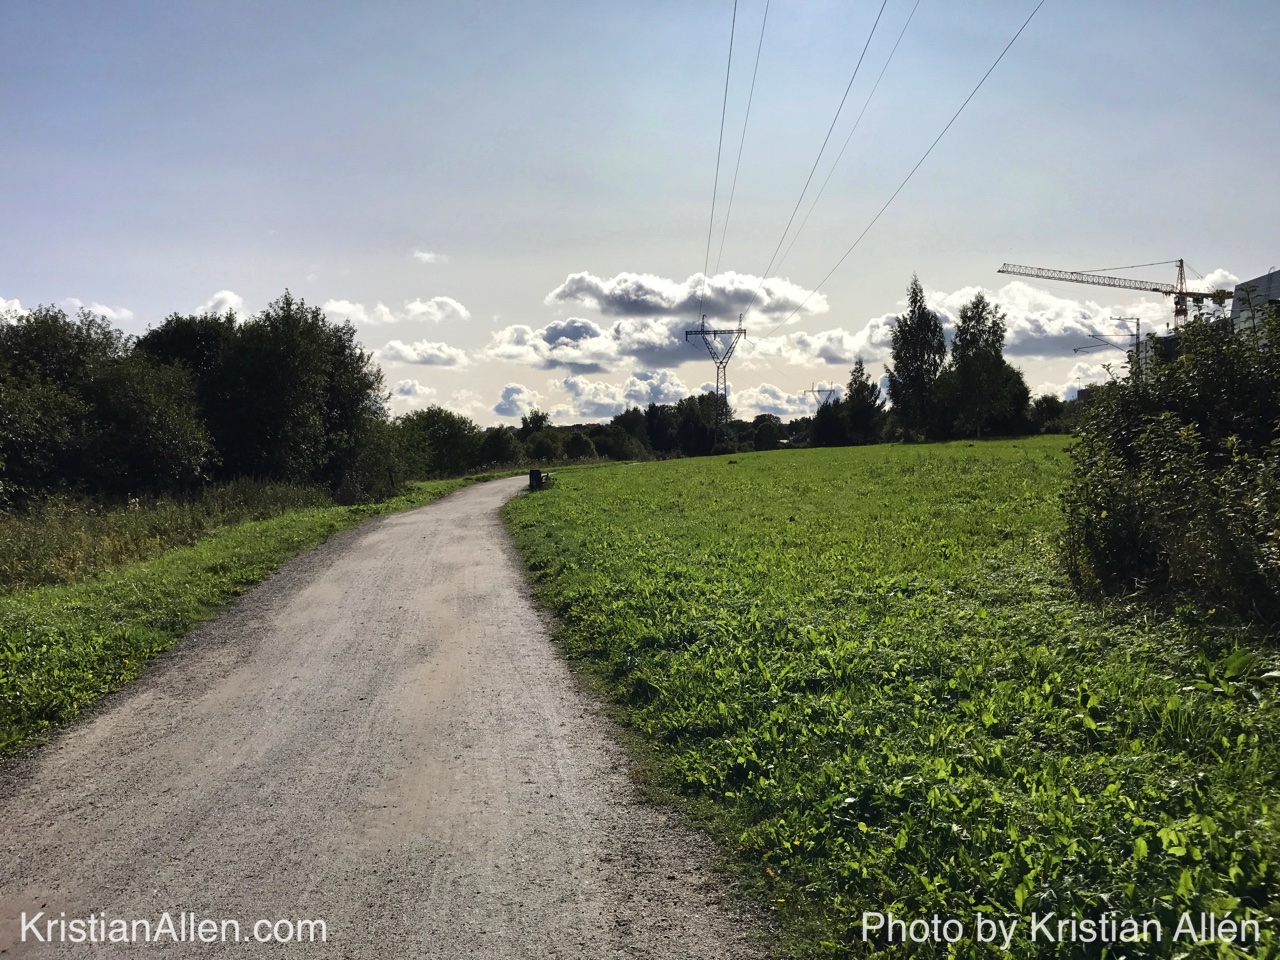 1.9.2017 14.55 km Run